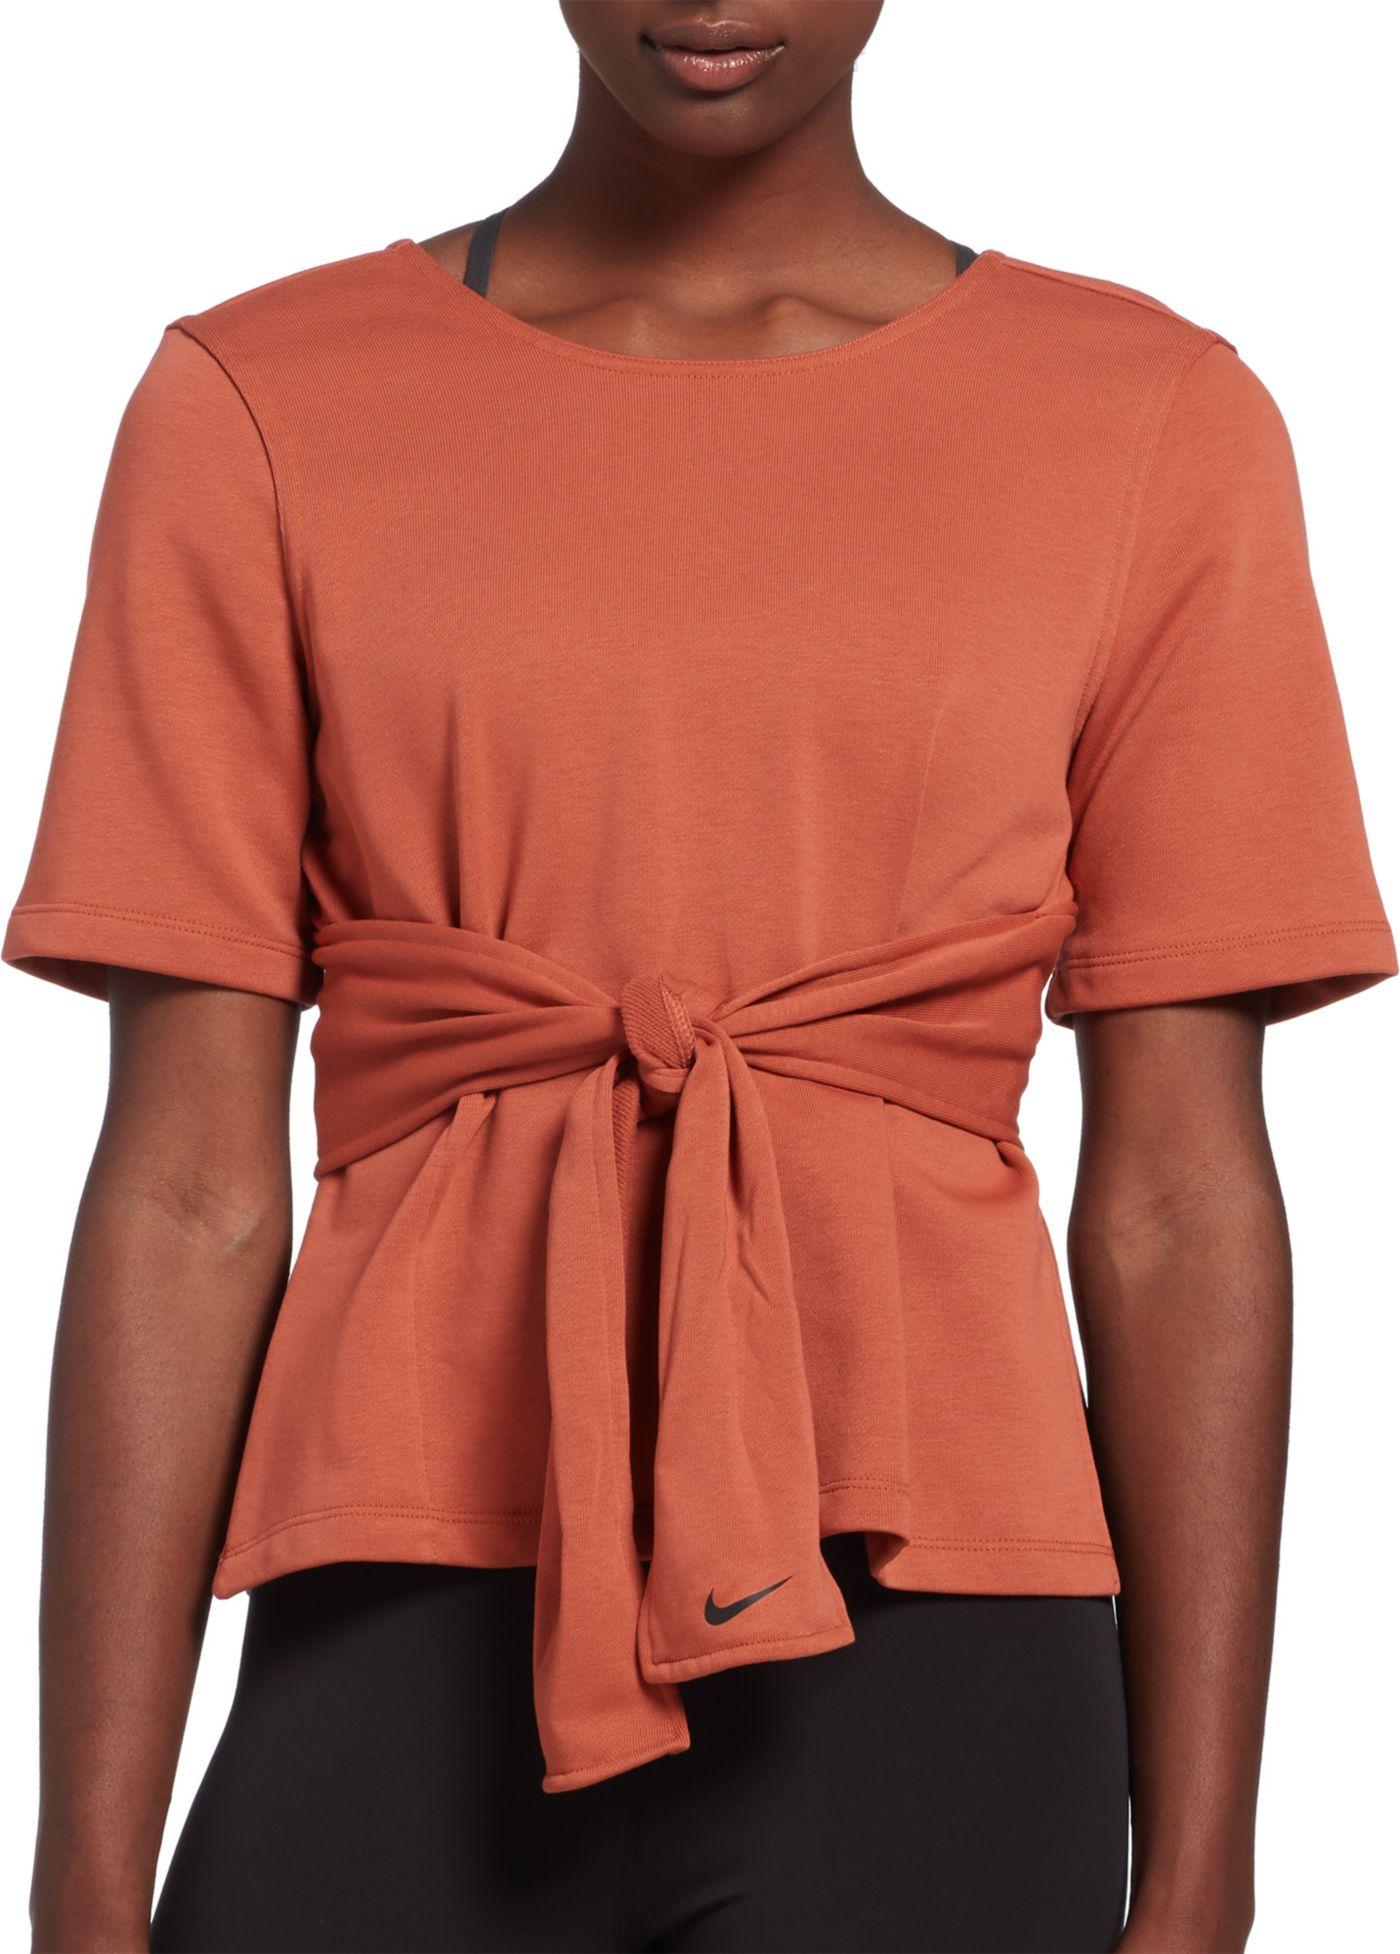 Nike Women's Short-Sleeve Training Top